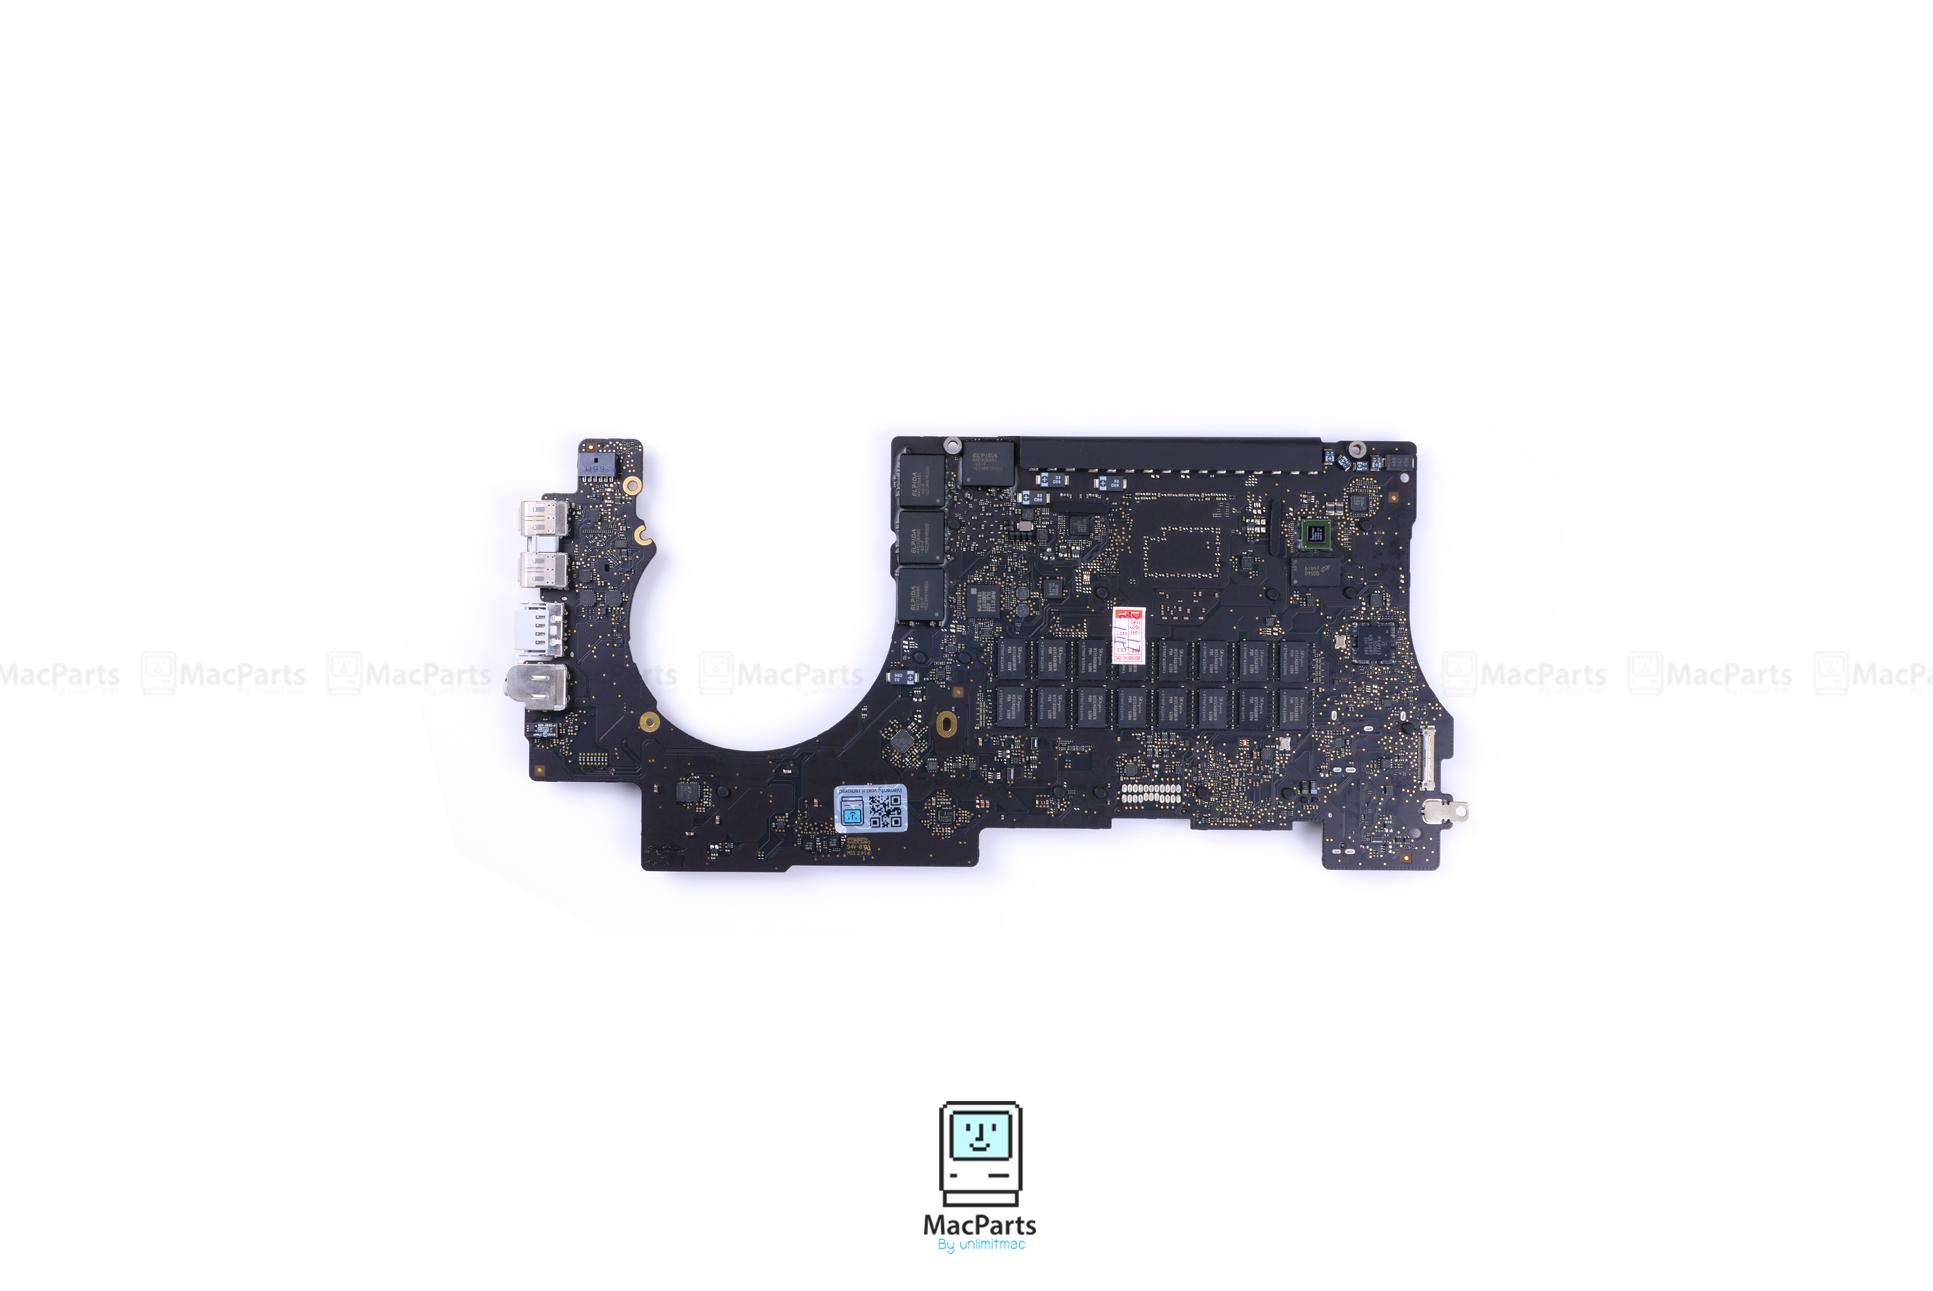 661-02525 MLB 2.5GHZ 16GB MacBook Pro 15-inch Retina Mid 2015